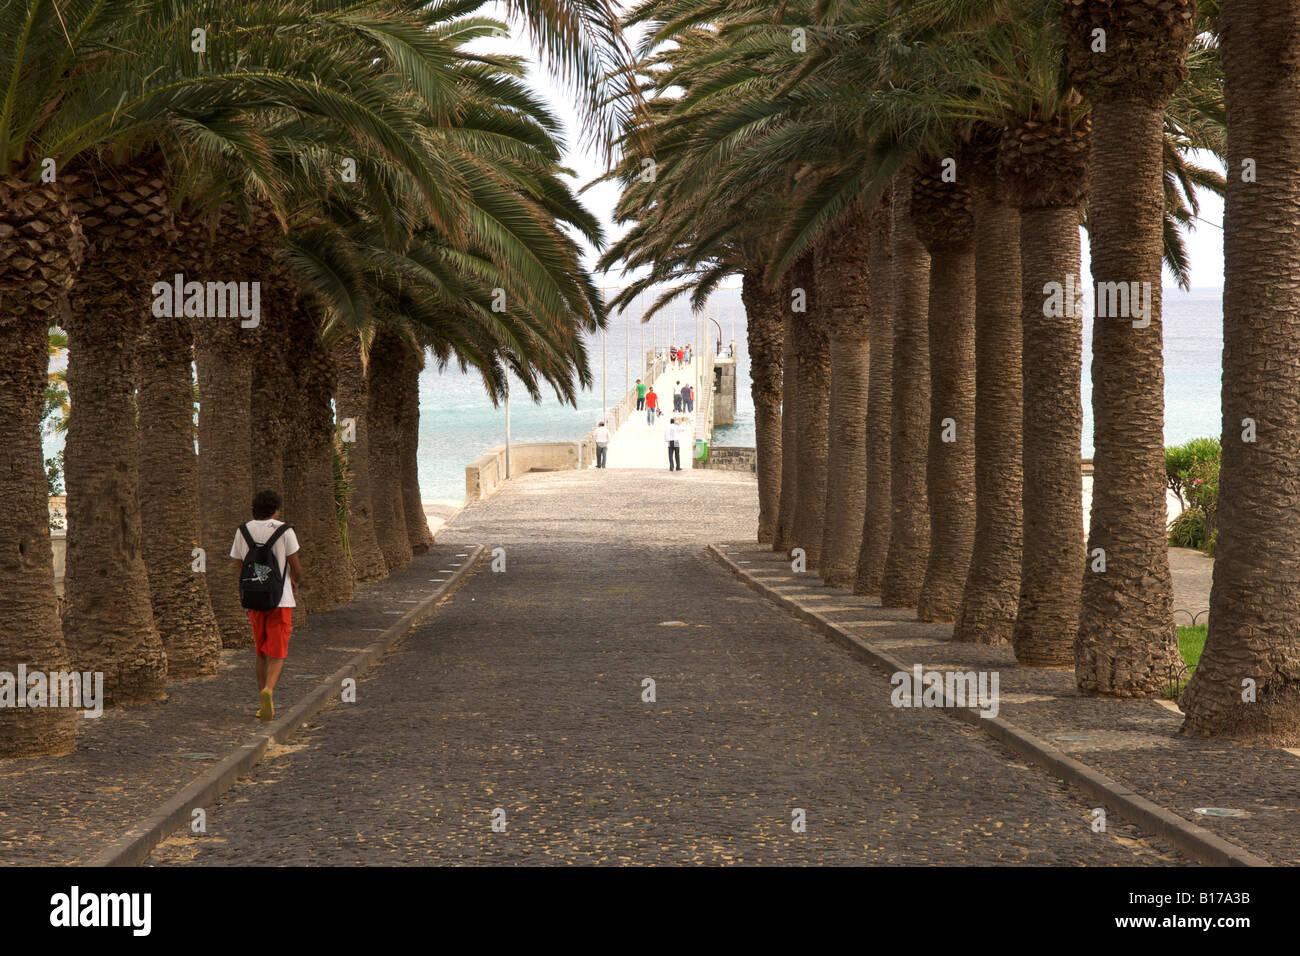 Palm-lined road leading to the Porto Santo pier on the Portuguese Atlantic island of Porto Santo. - Stock Image